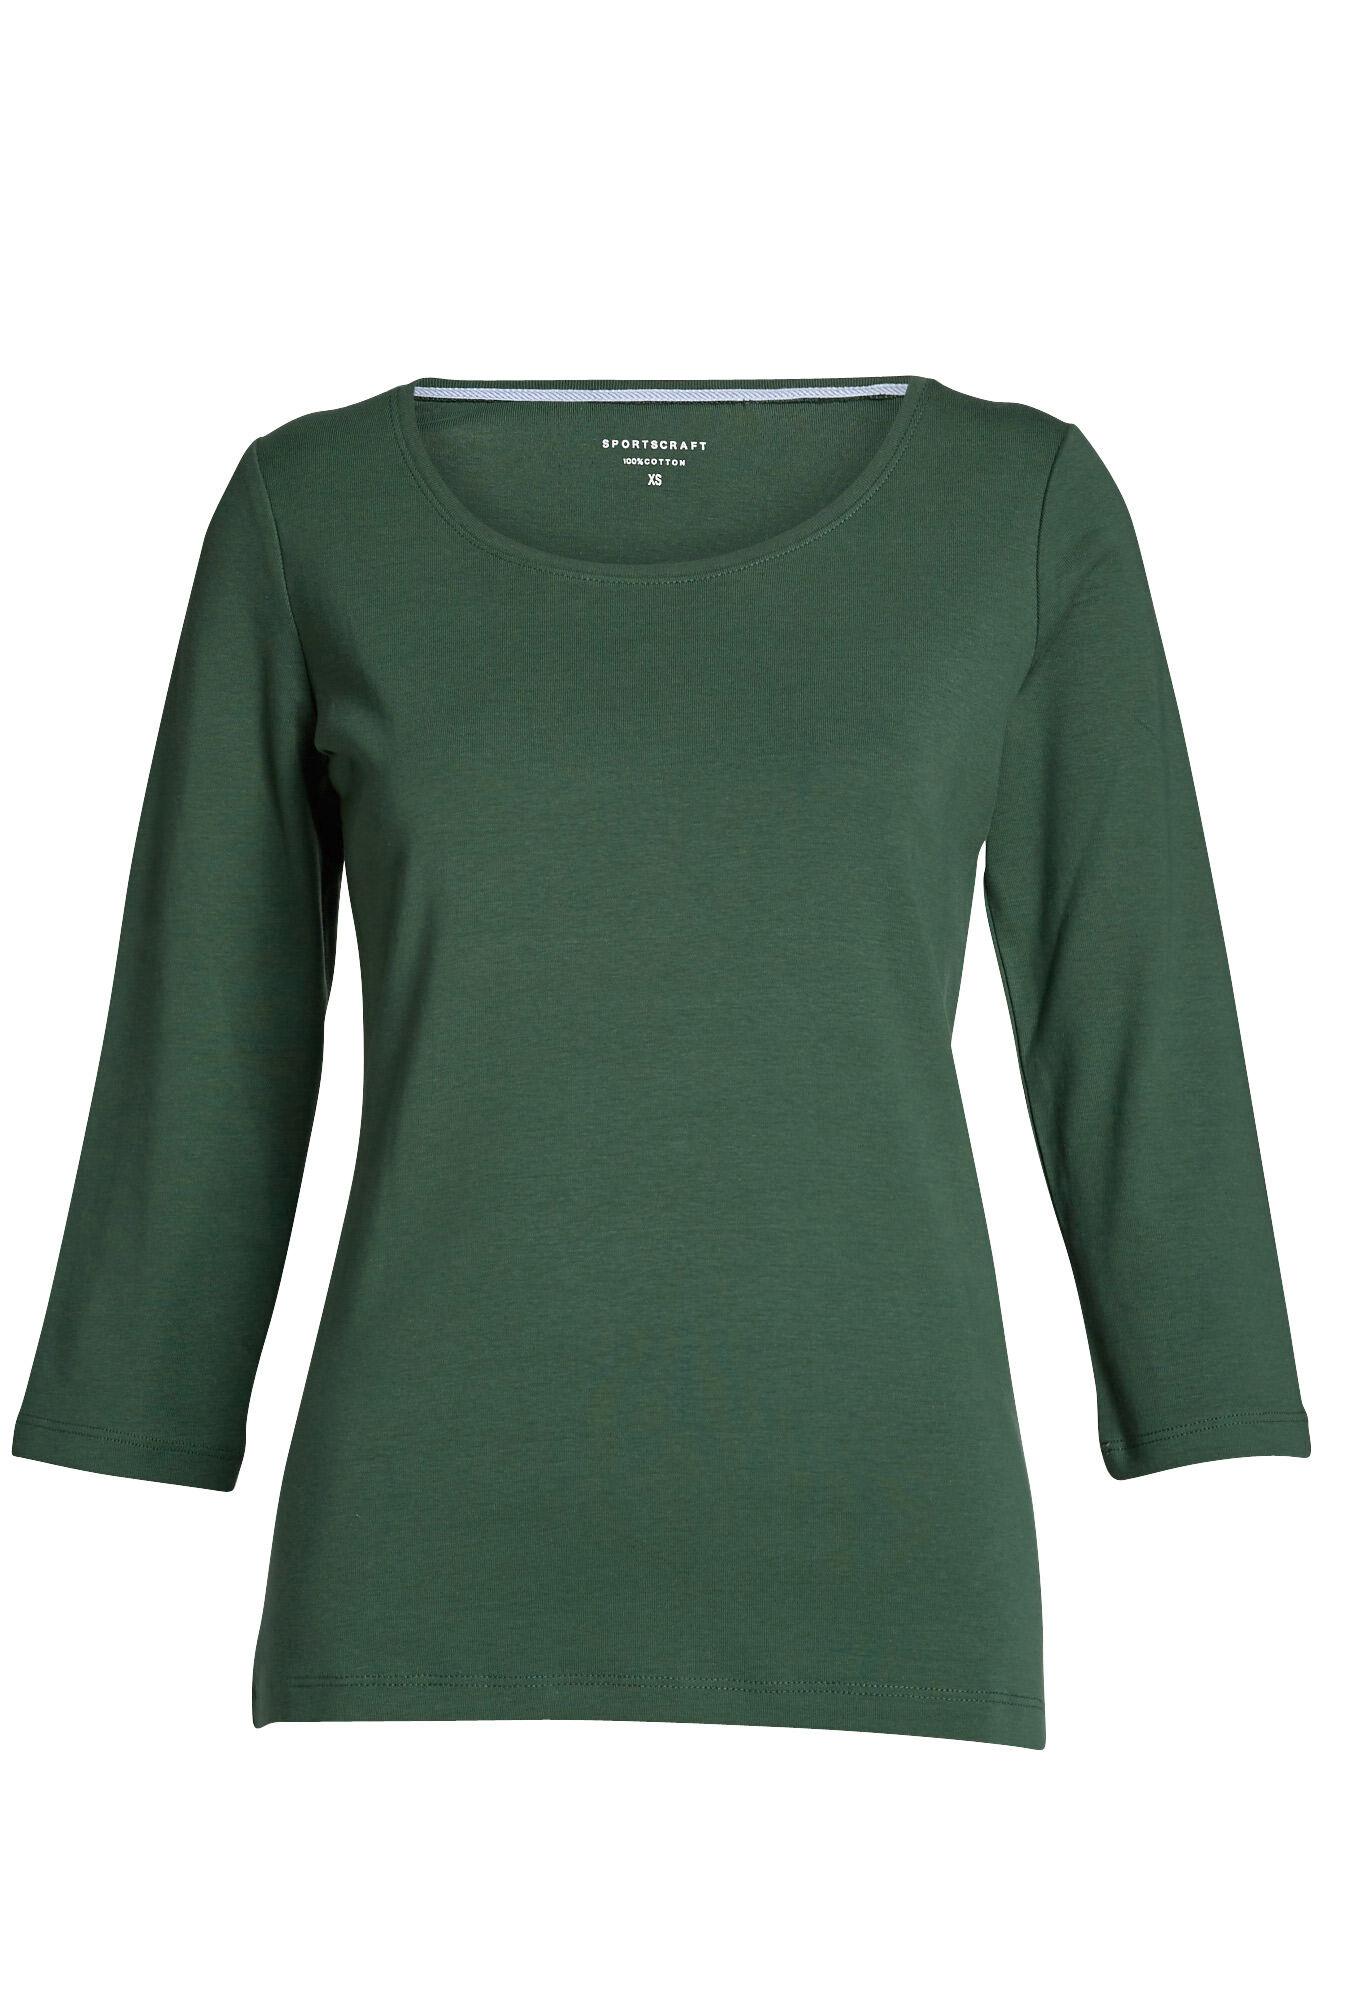 NEW-Sportscraft-WOMENS-Heidi-3-4-Sleeve-Tee-Tops-amp-Blouses